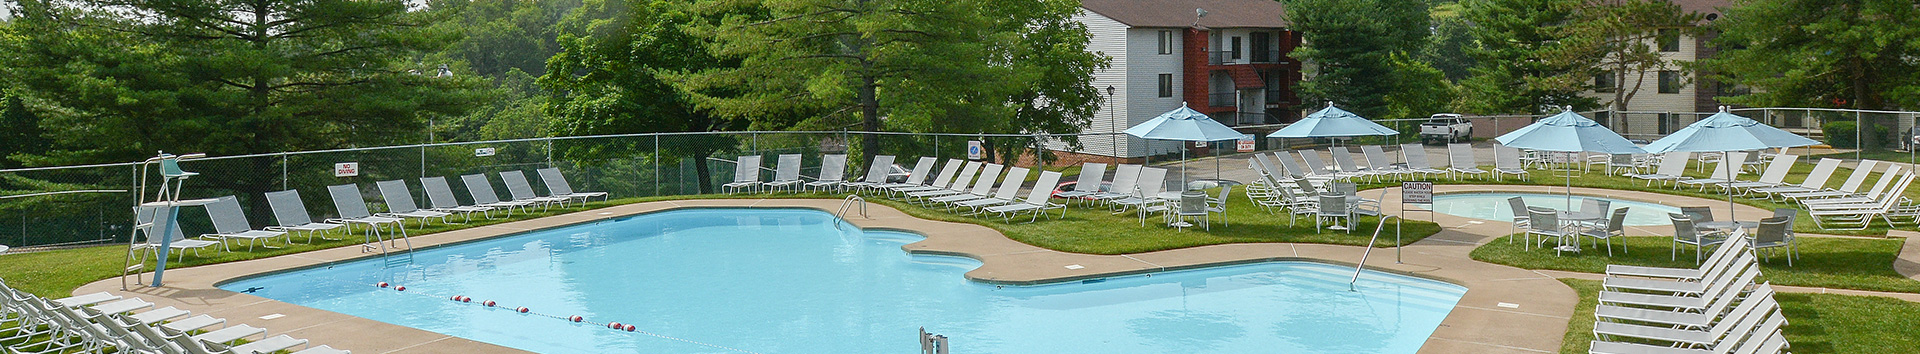 Swimming Pool of Roxalana Hills Apartments at Manor Communities, Charleston/West Virginia